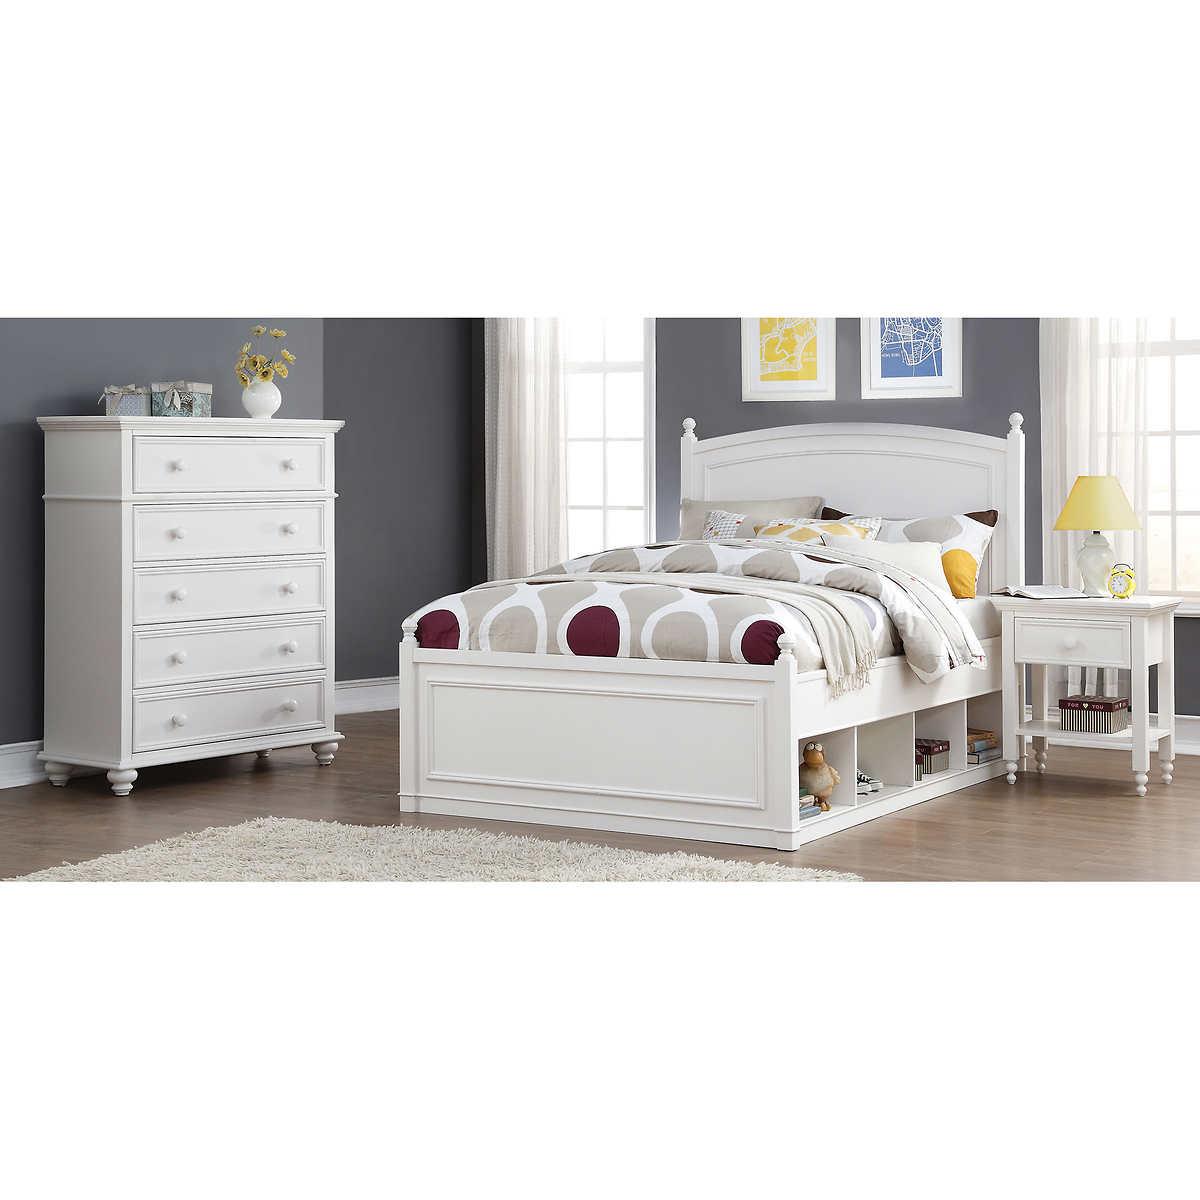 Mila 3 Piece Full Storage Bedroom Set